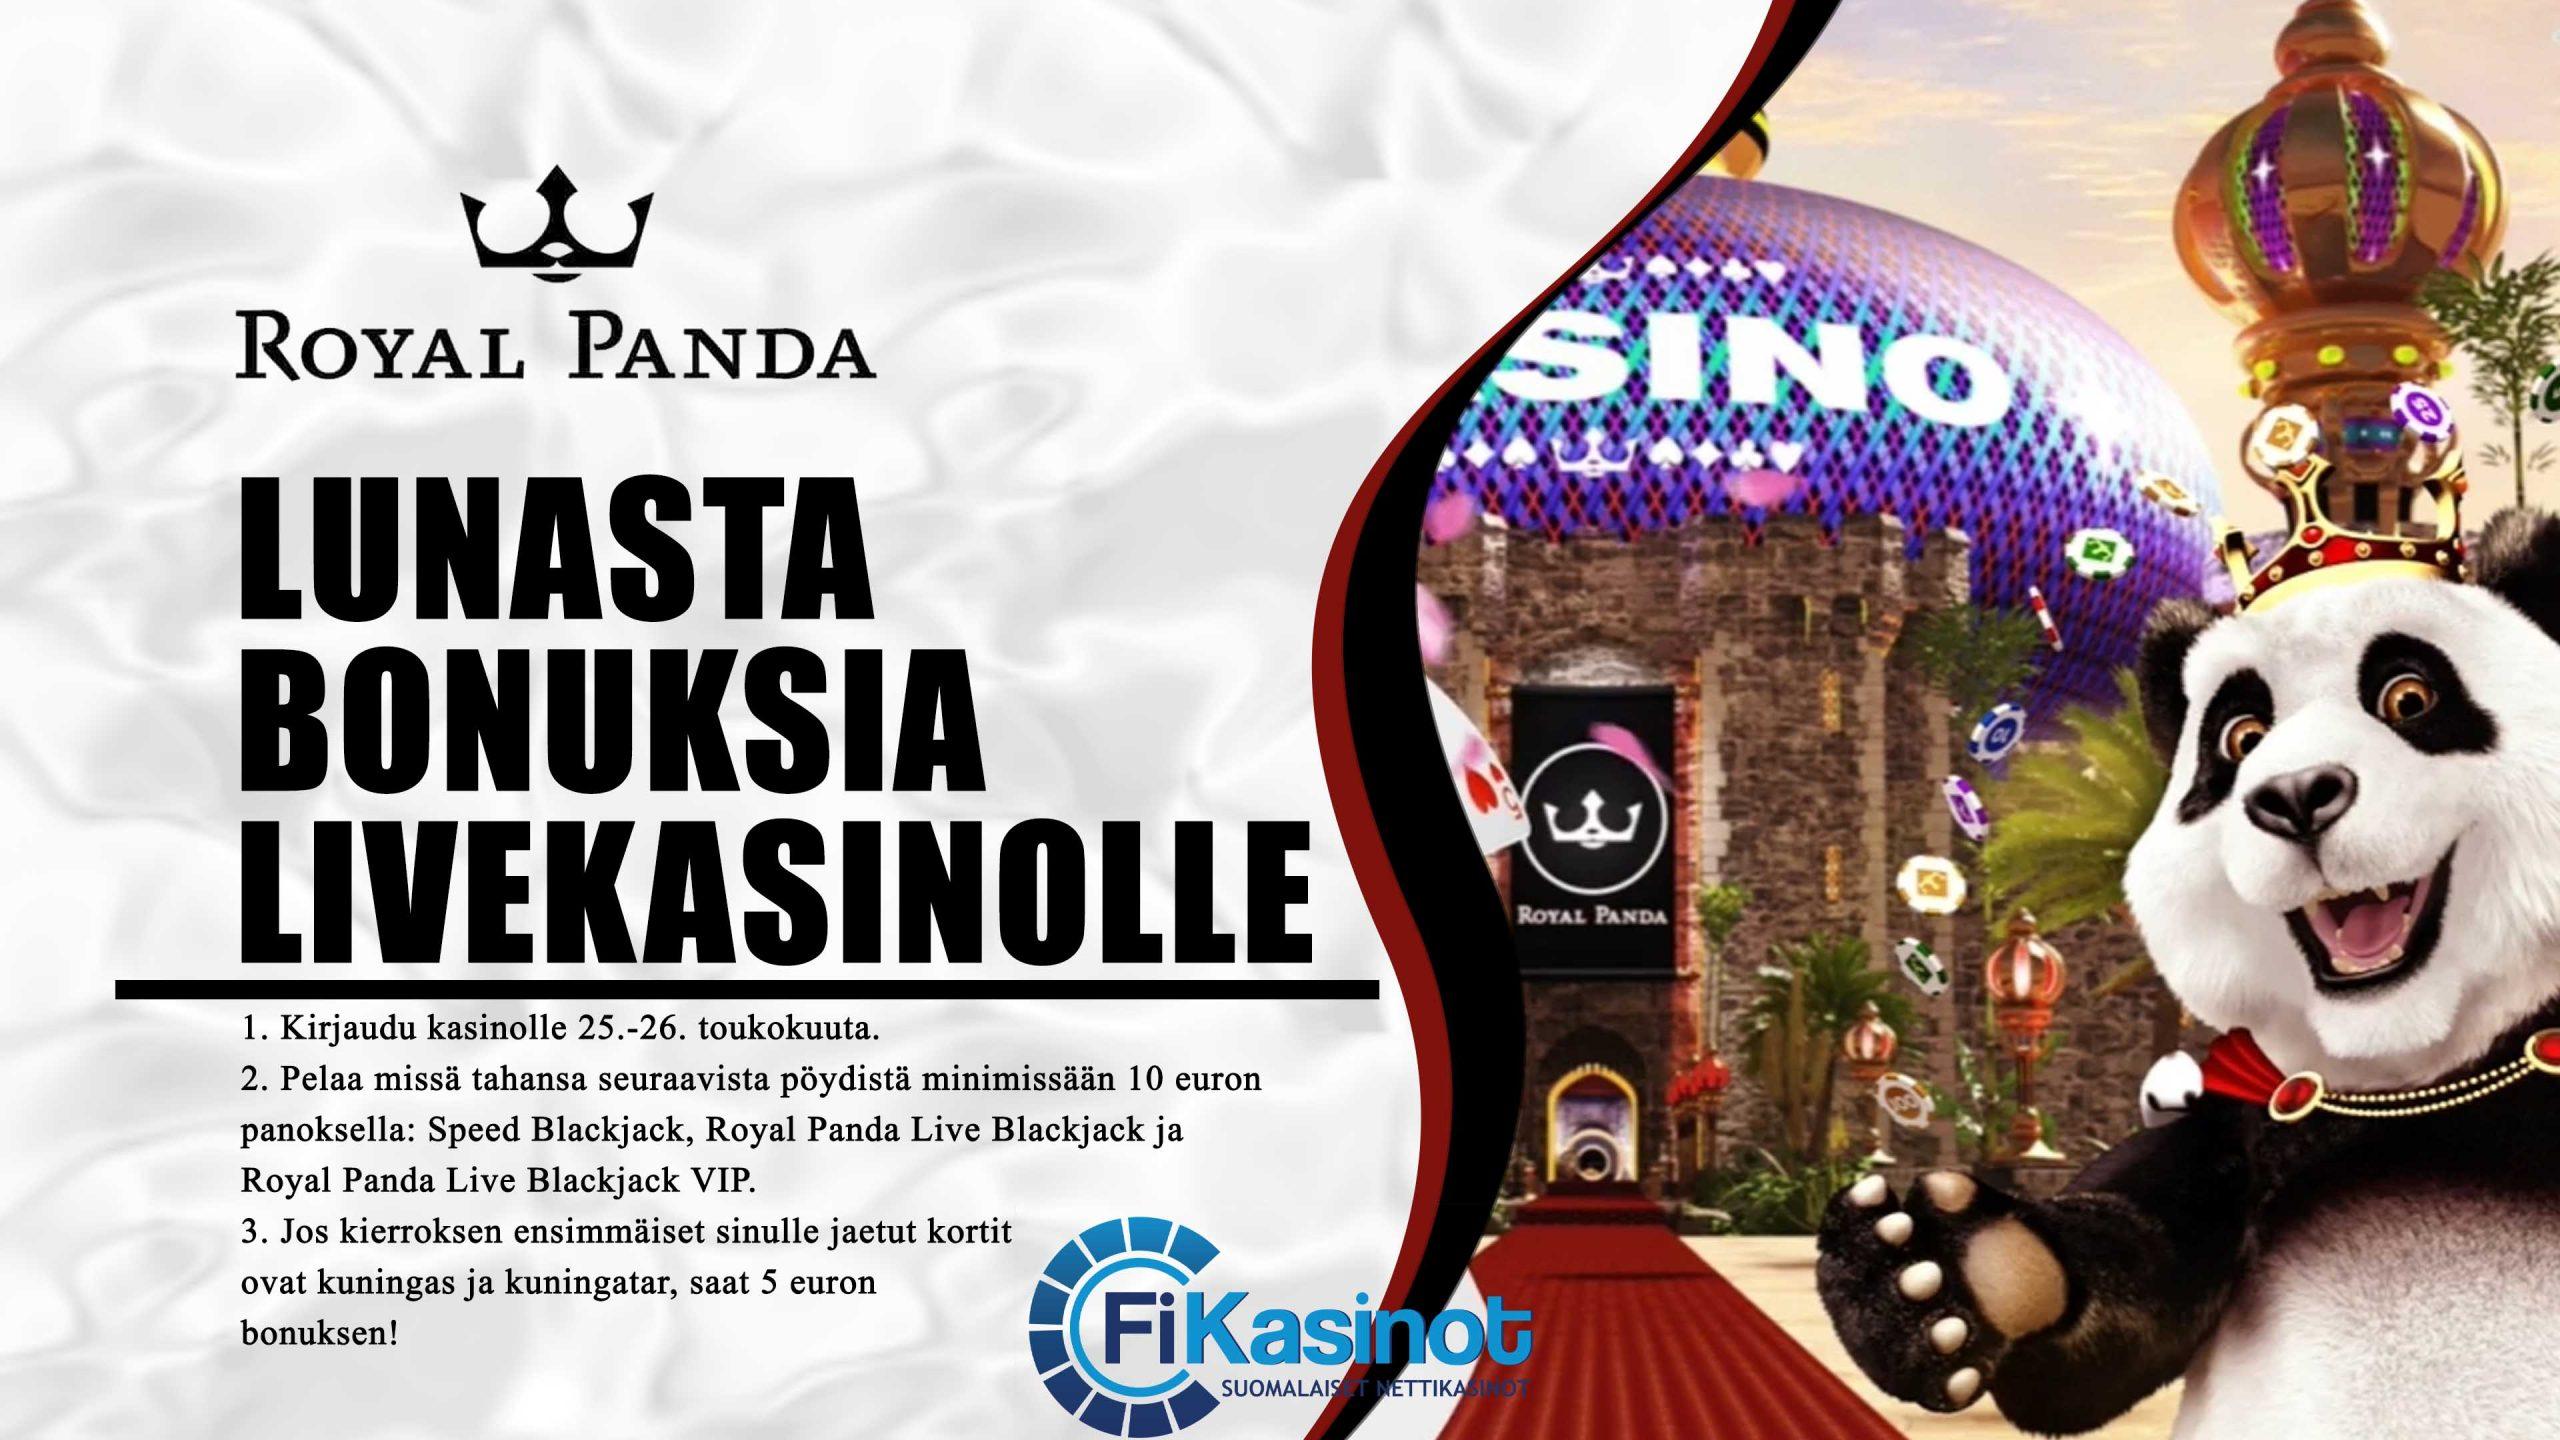 Bonuksia Royal Pandan live-kasinolla